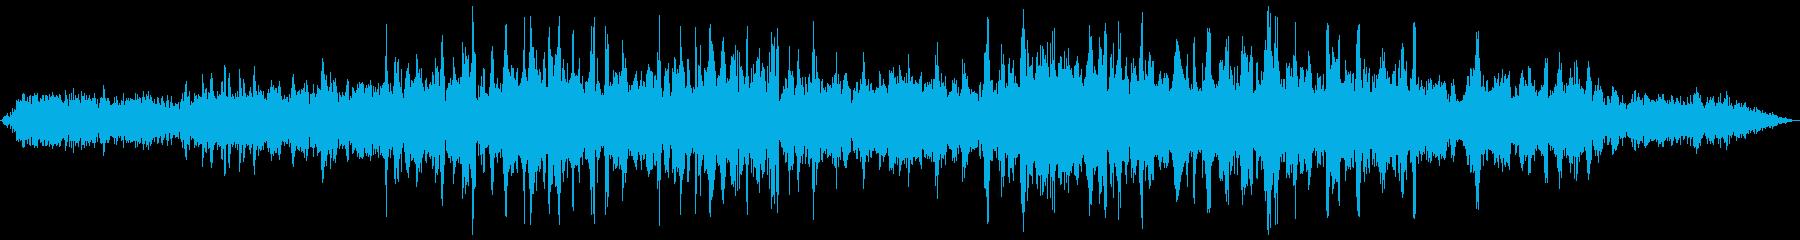 ALIEN RADIO CHATT...の再生済みの波形